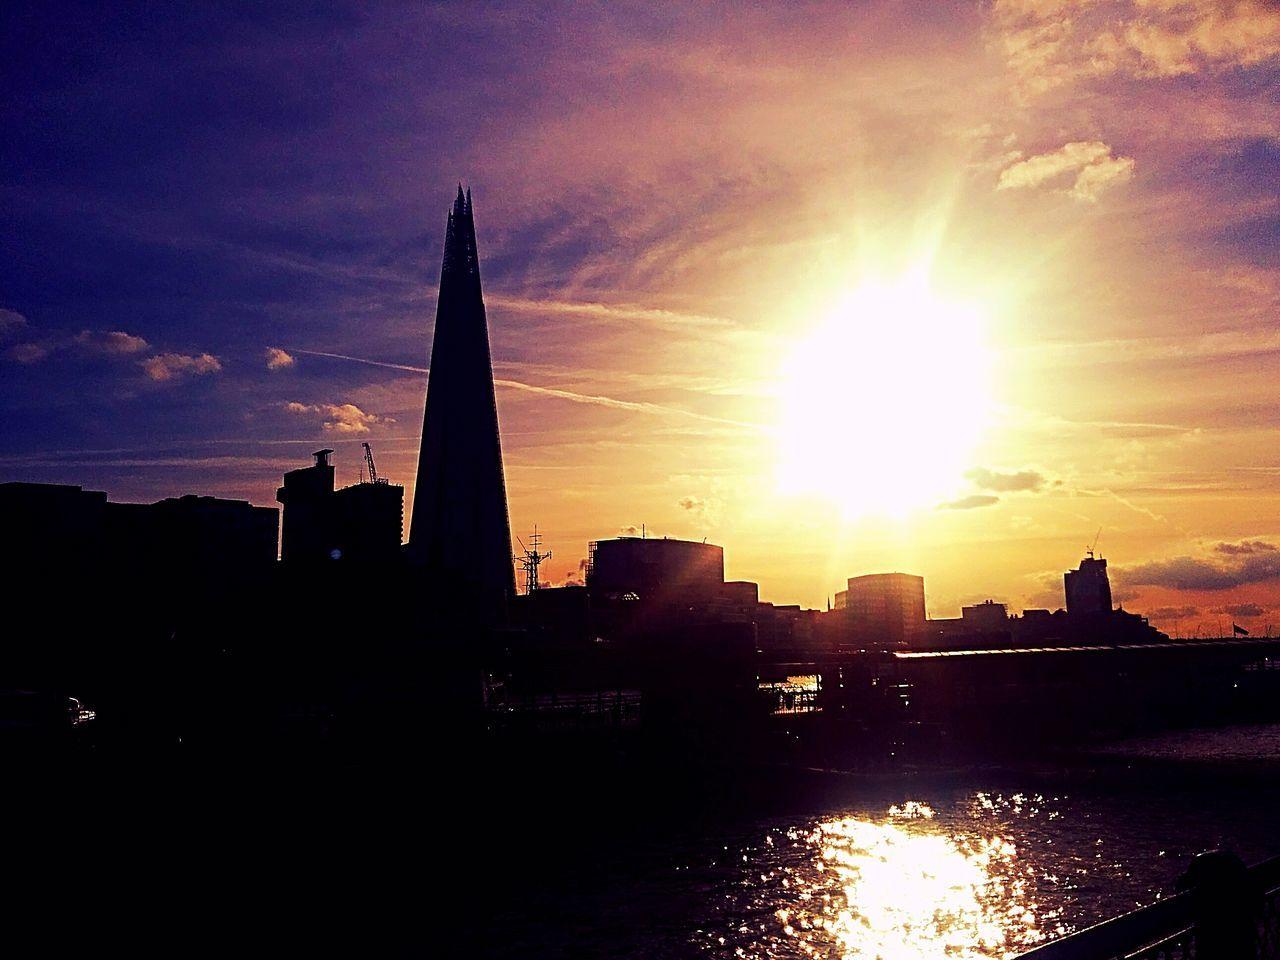 London skyline in the sunset Sunset Urban Skyline Travel Destinations Cityscape Dramatic Sky Architecture Skyscraper City Cloud - Sky Awe Sky Illuminated Modern Scenics No People